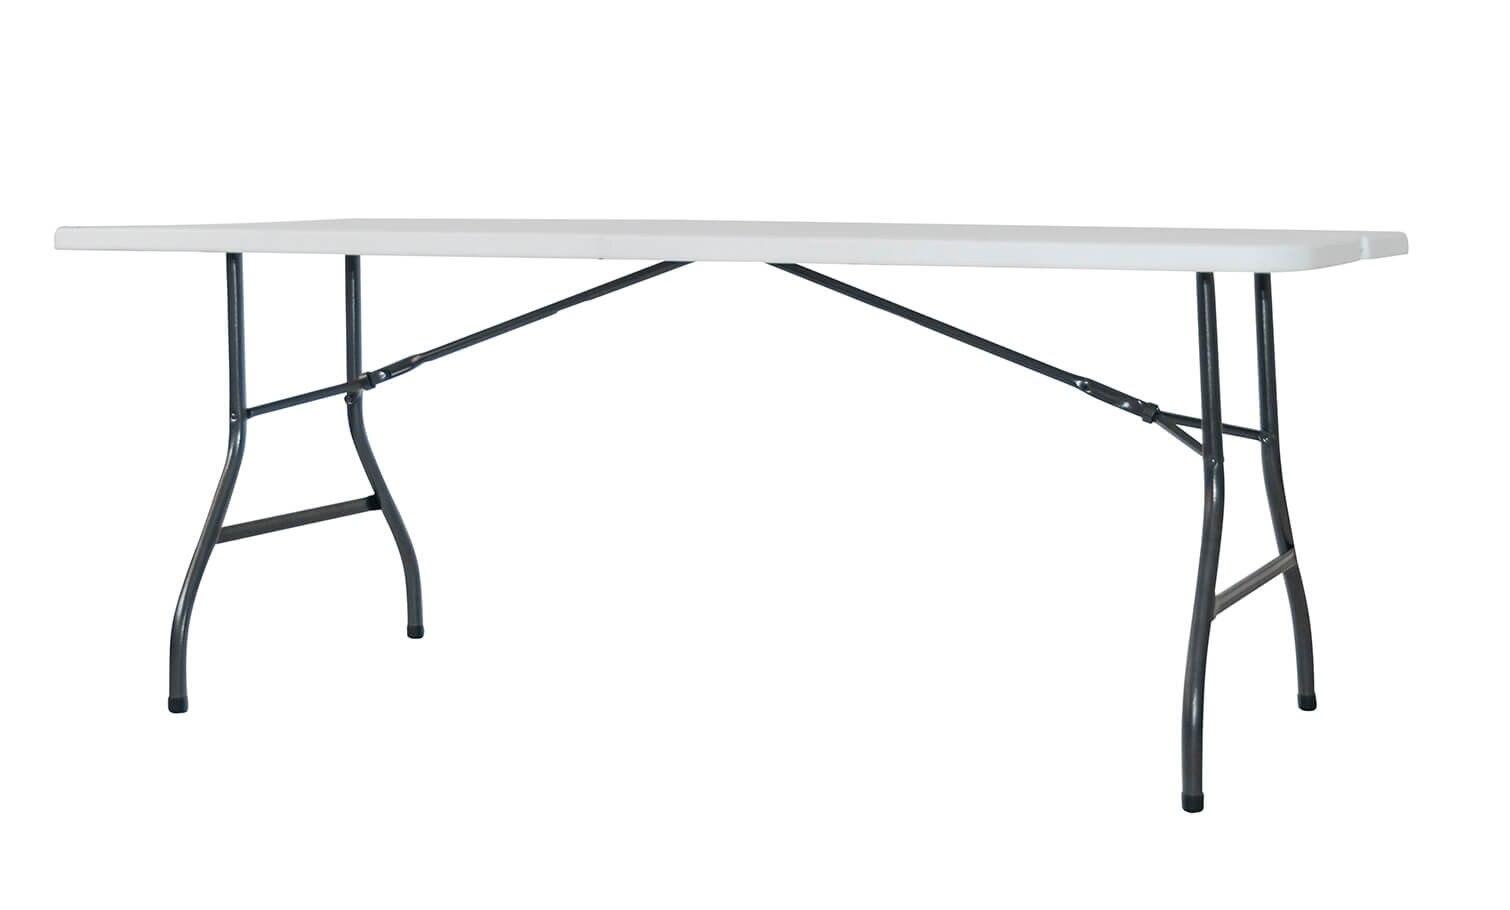 Newstorm Steel Table Folding Type Suitcase Oskar180 + Black Case-4999100100242L